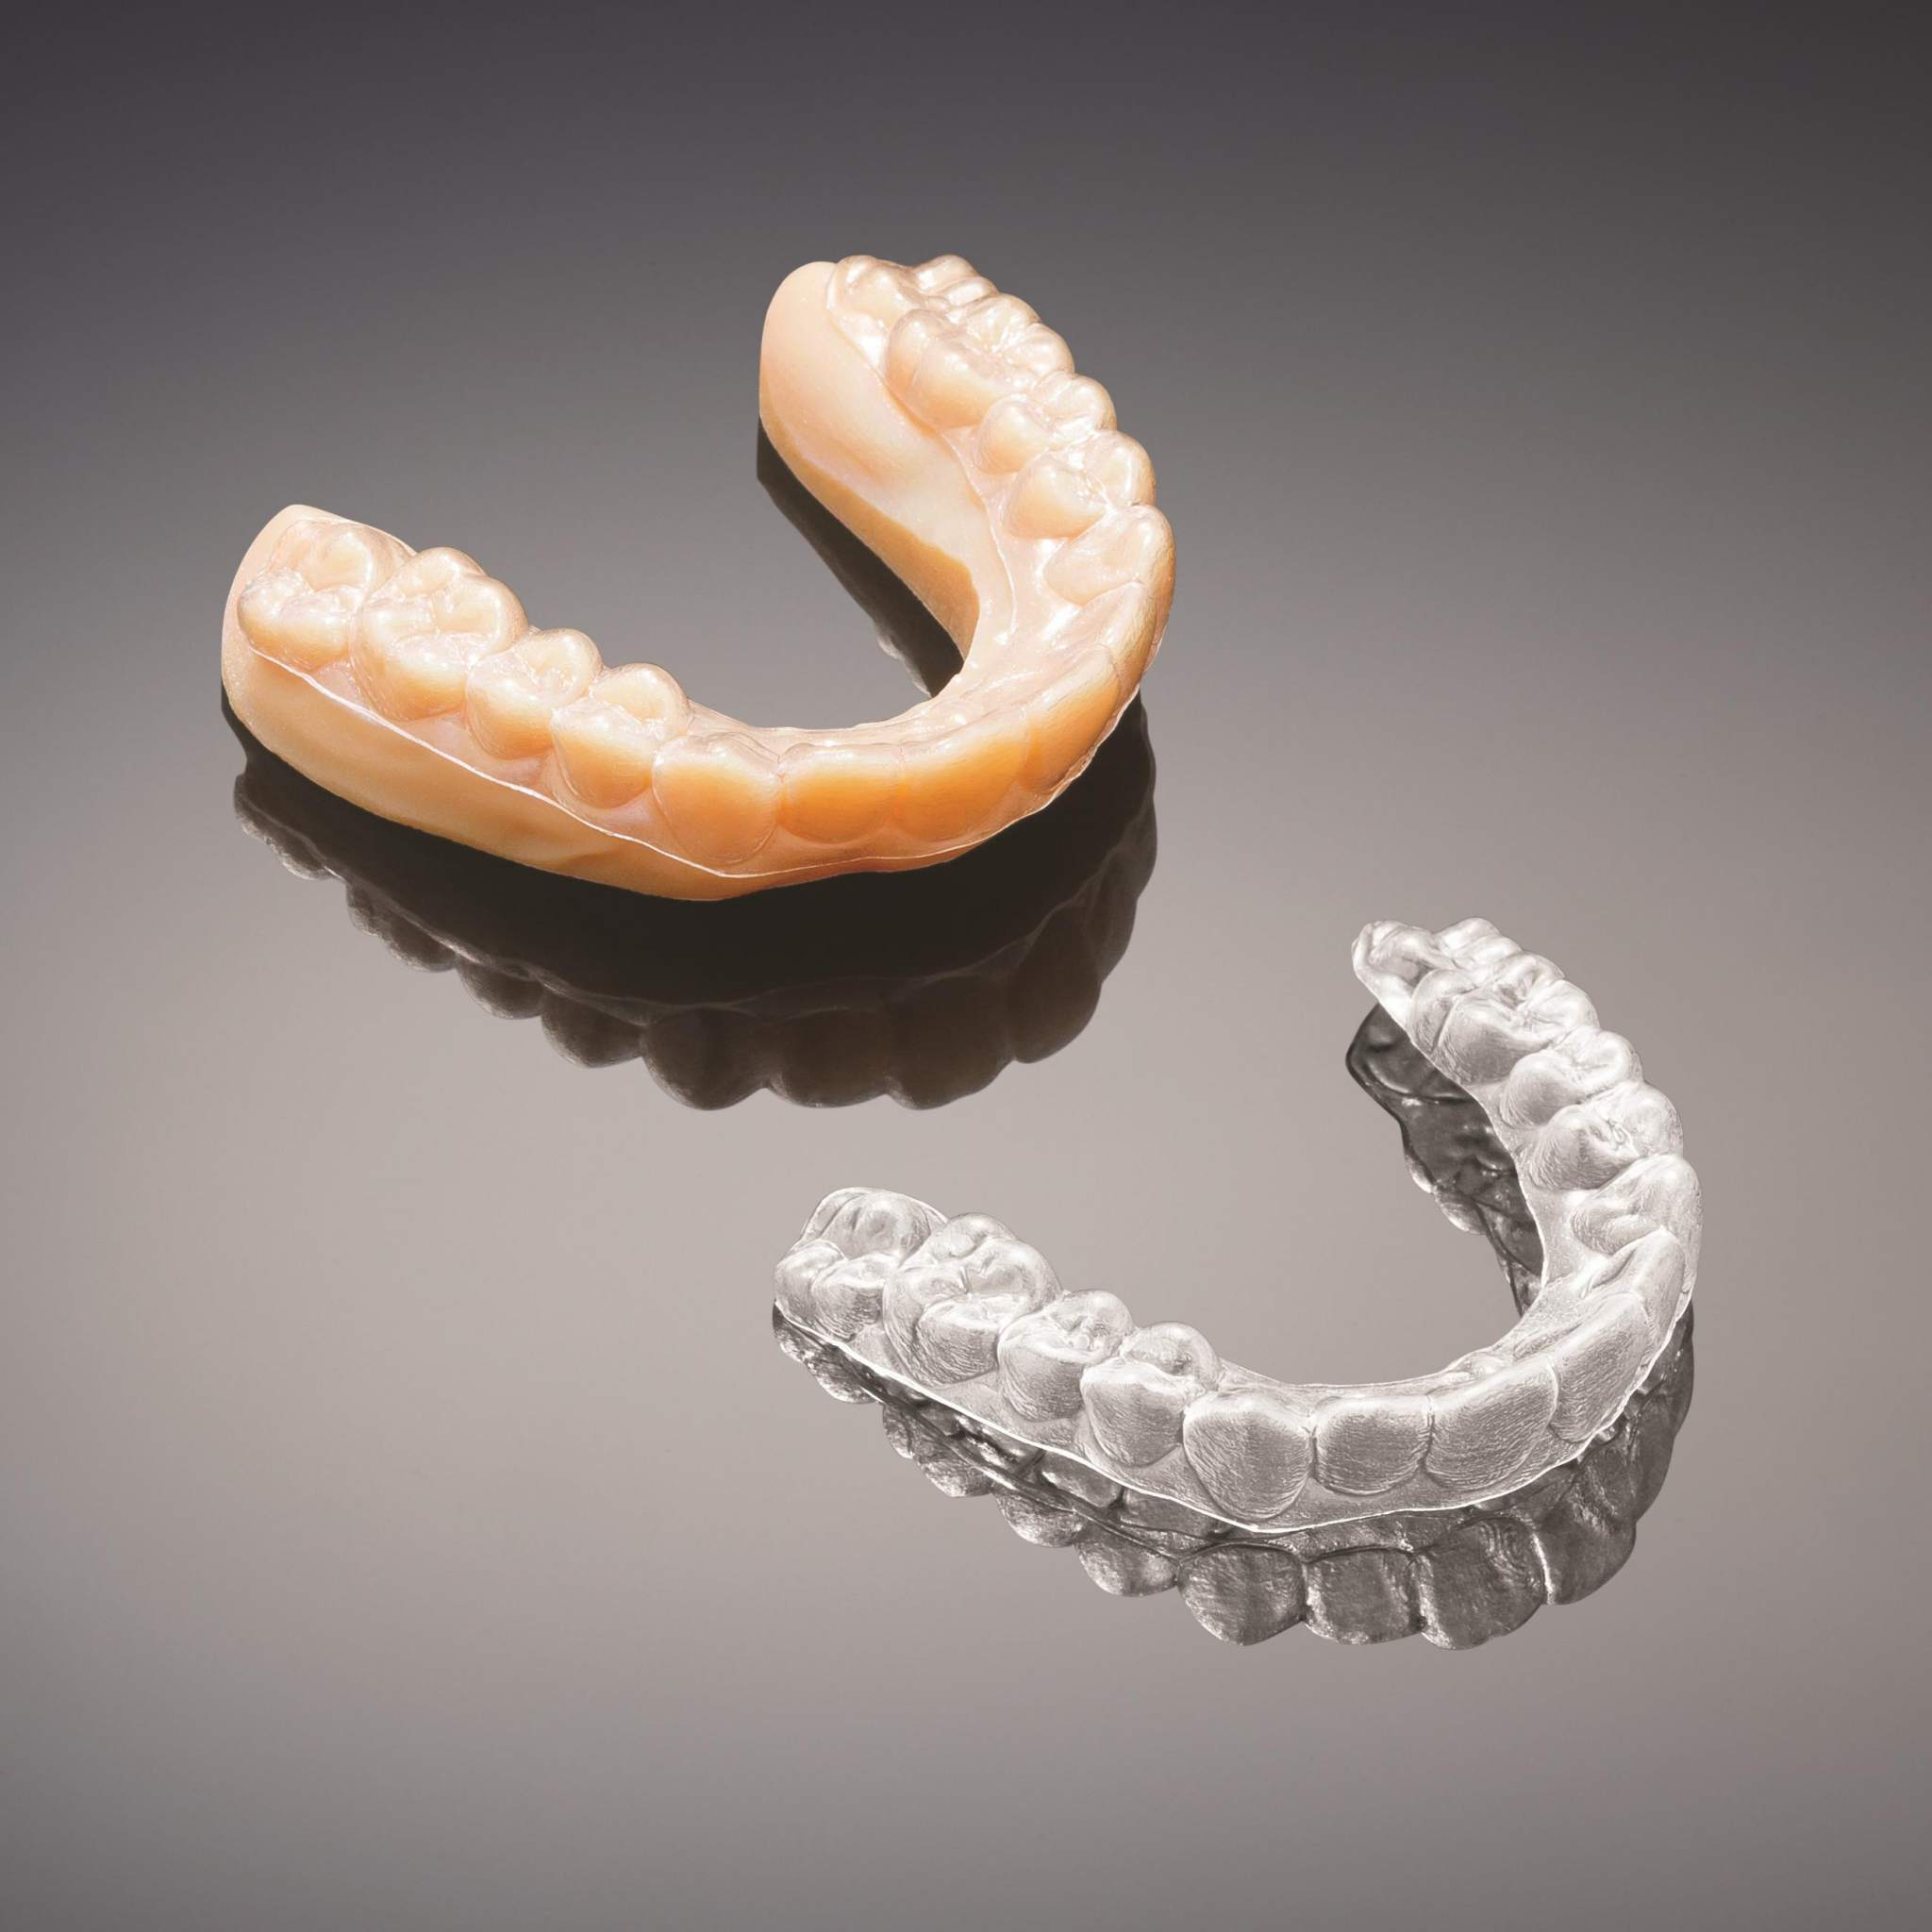 3D printed mold (upper left) and resulting aligner. Image via Stratasys.